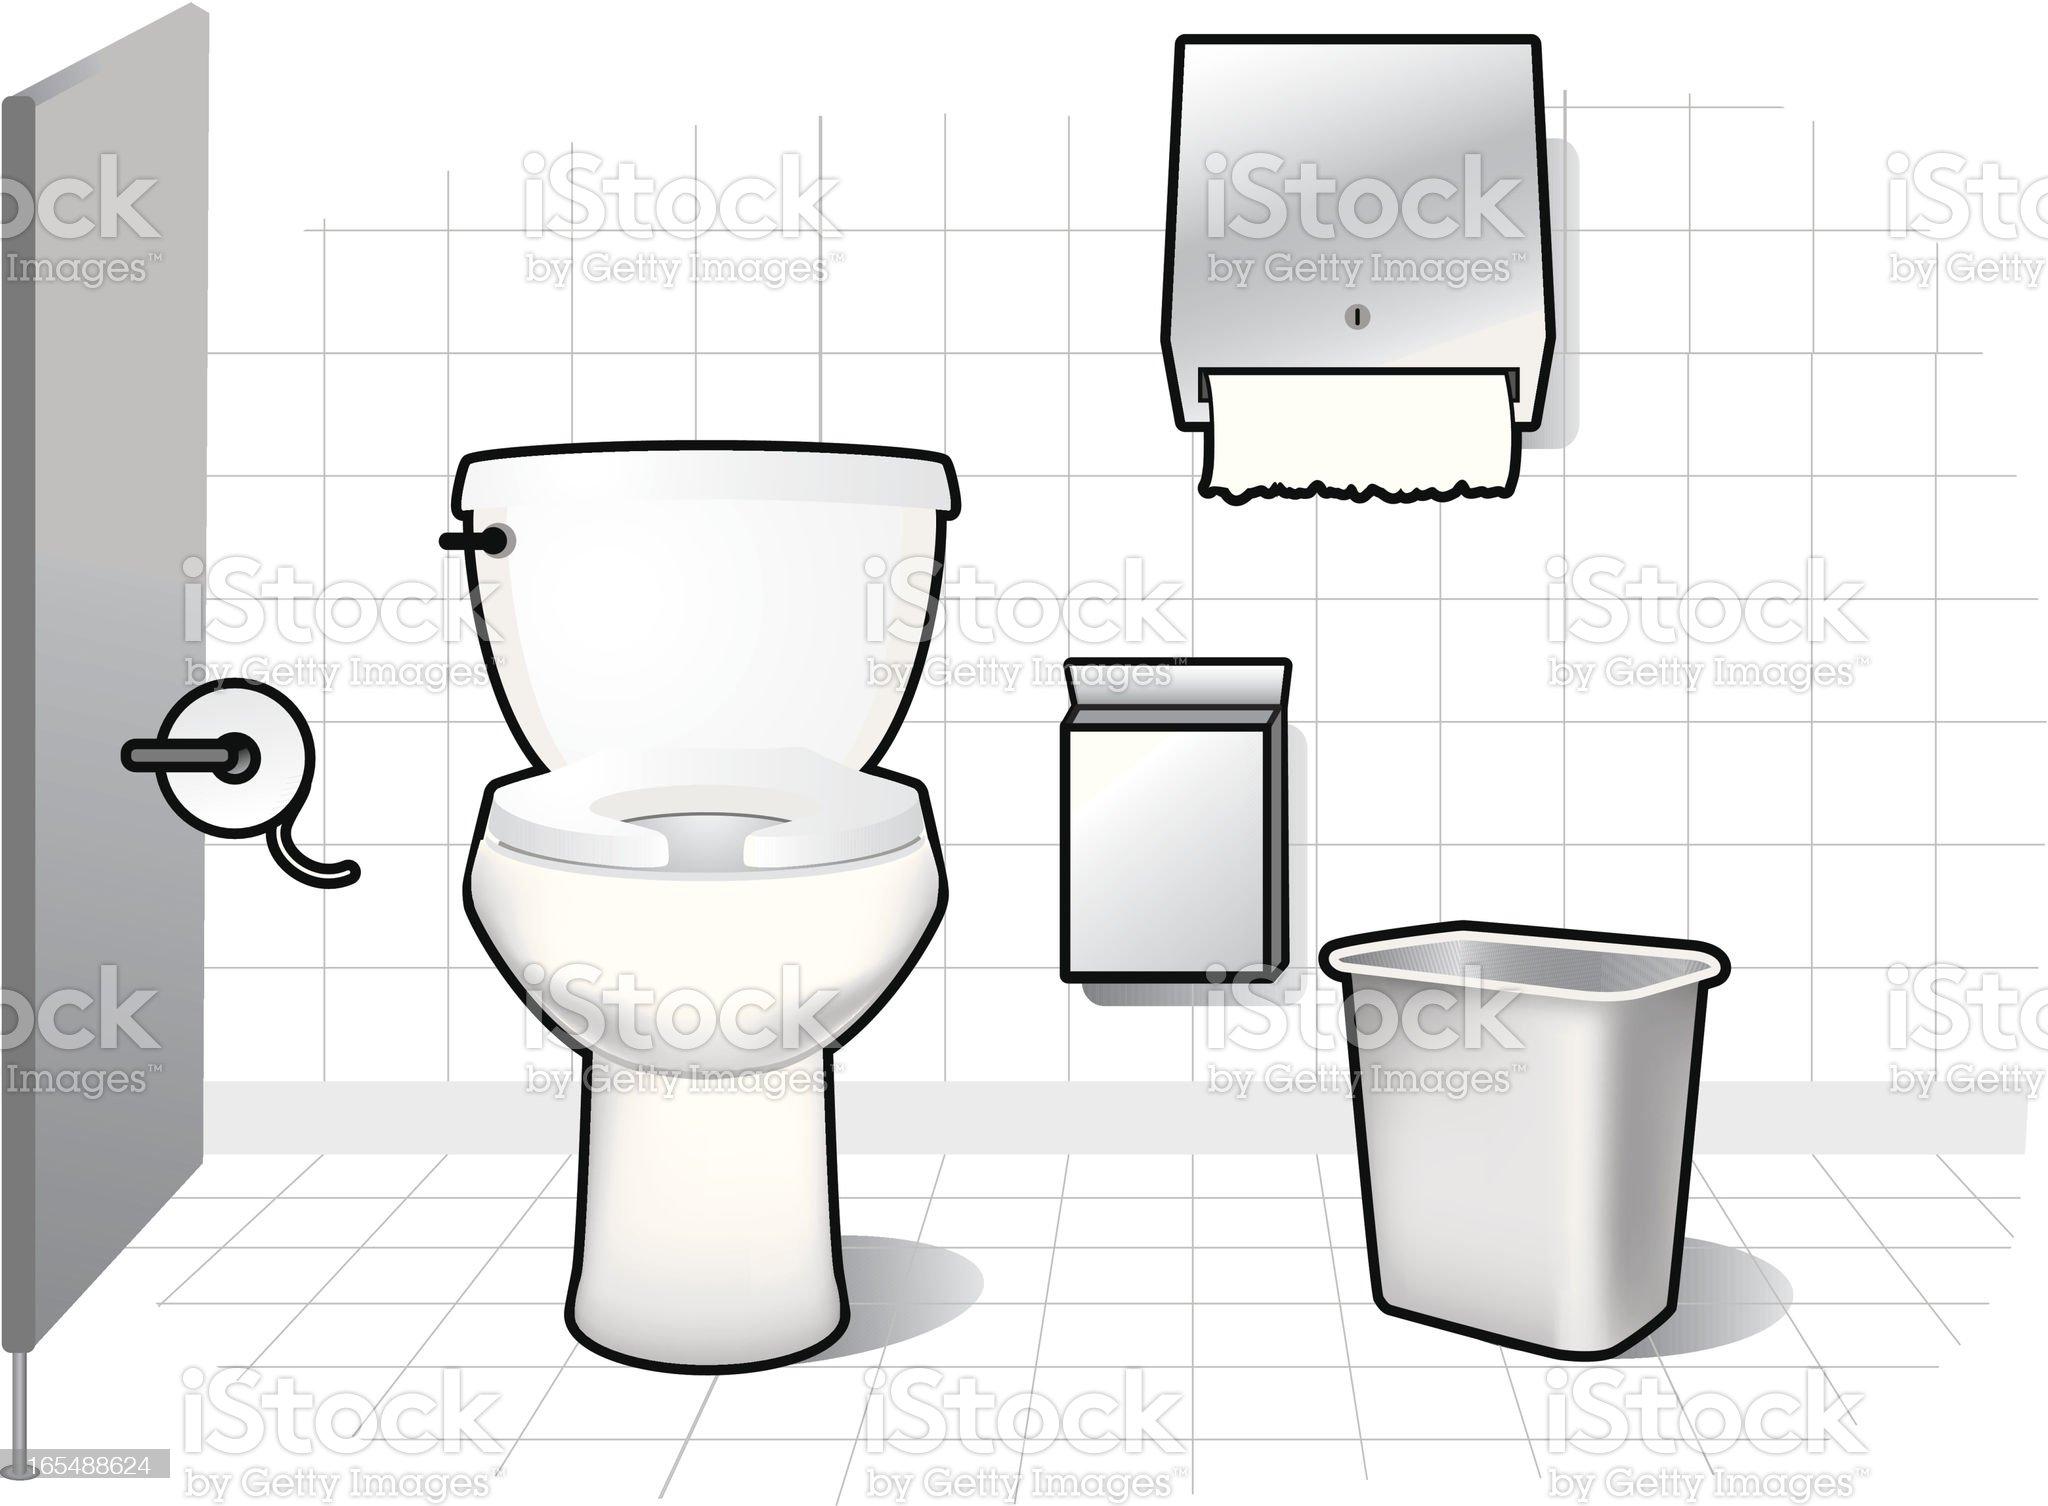 Restroom Elements royalty-free stock vector art